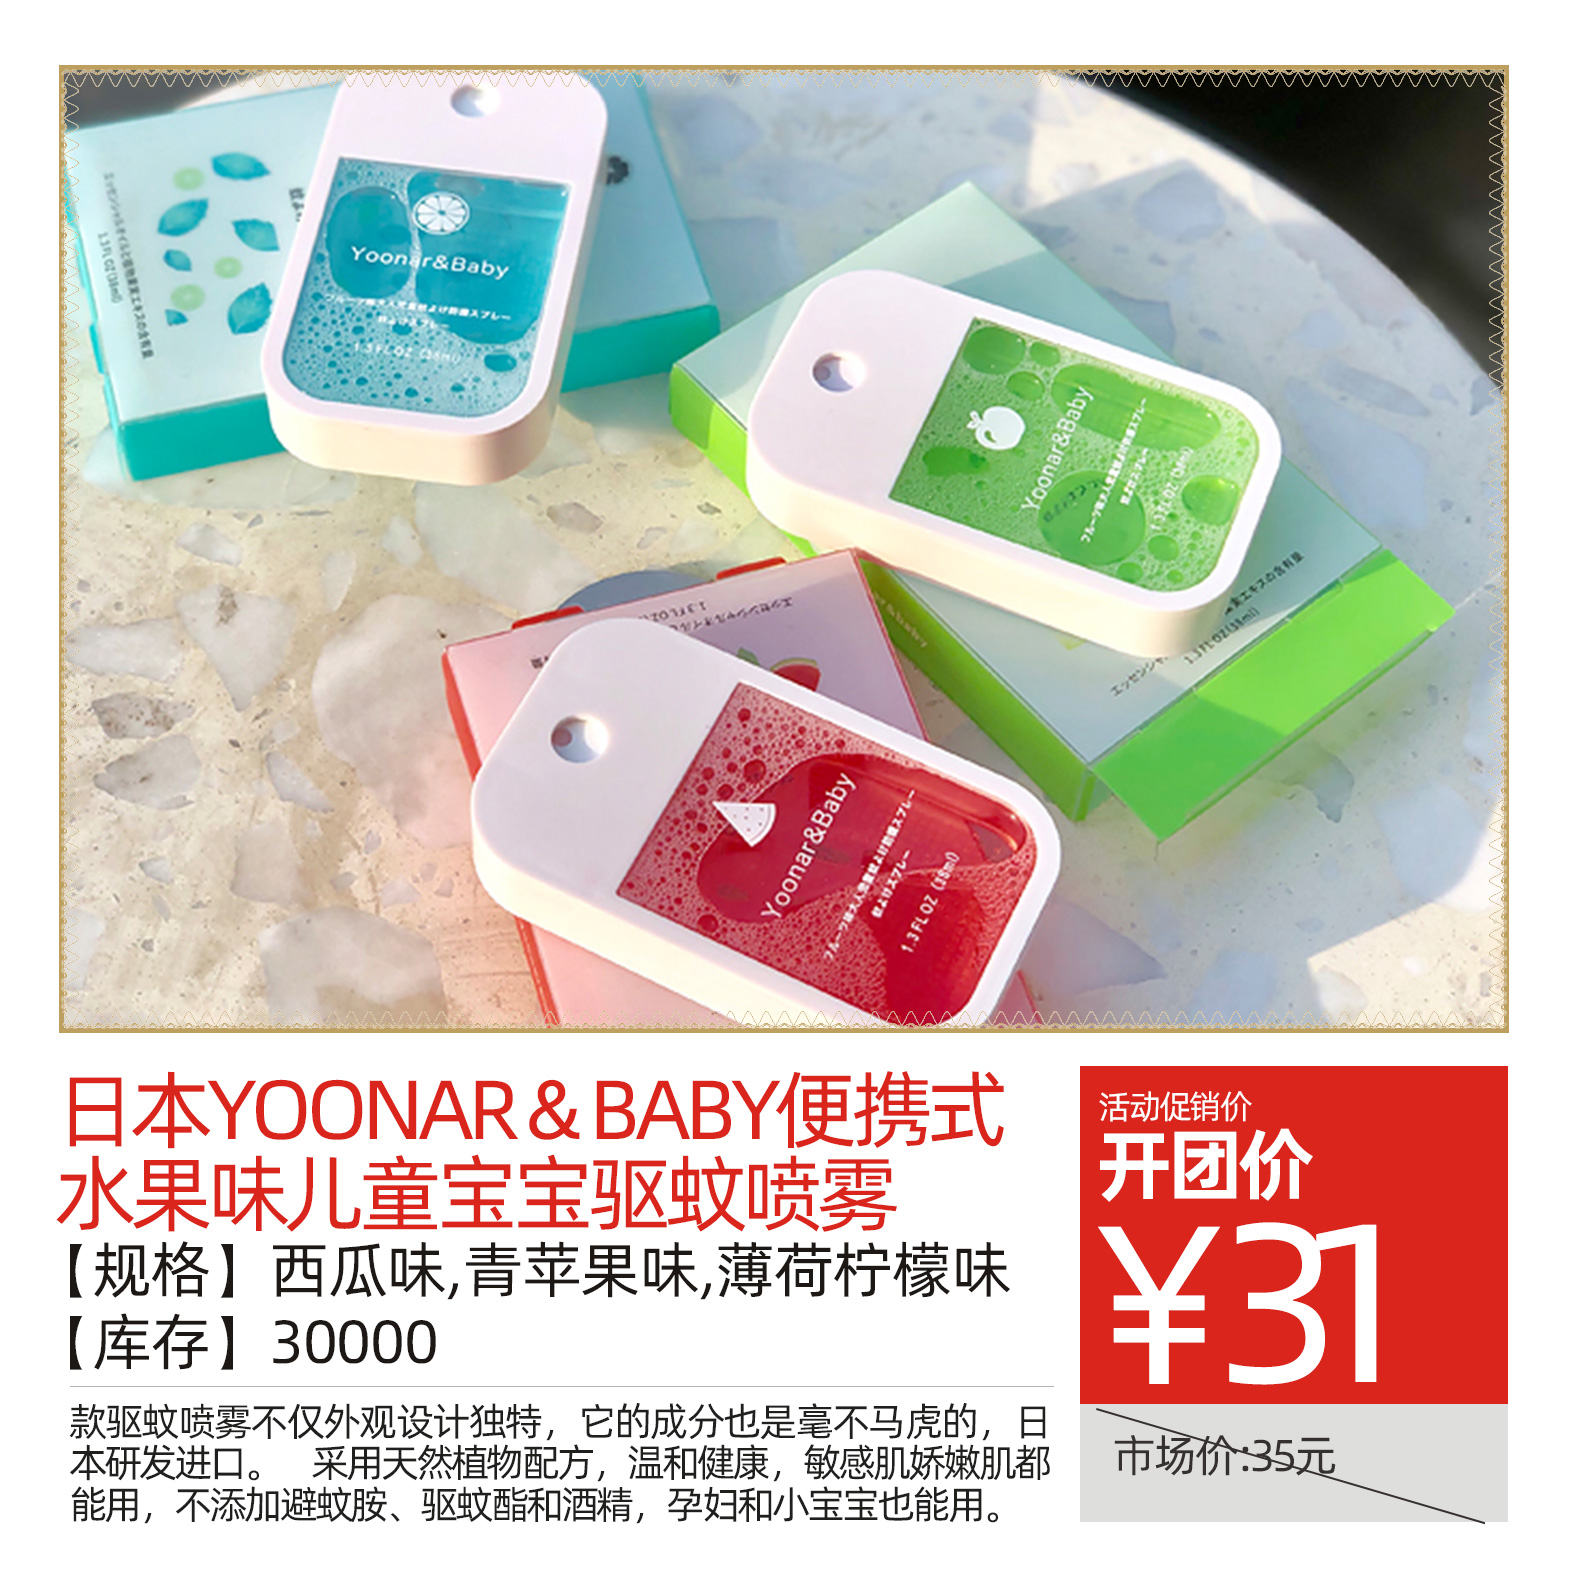 日本Yoonar&Baby便携式水果味儿童宝宝驱蚊喷雾